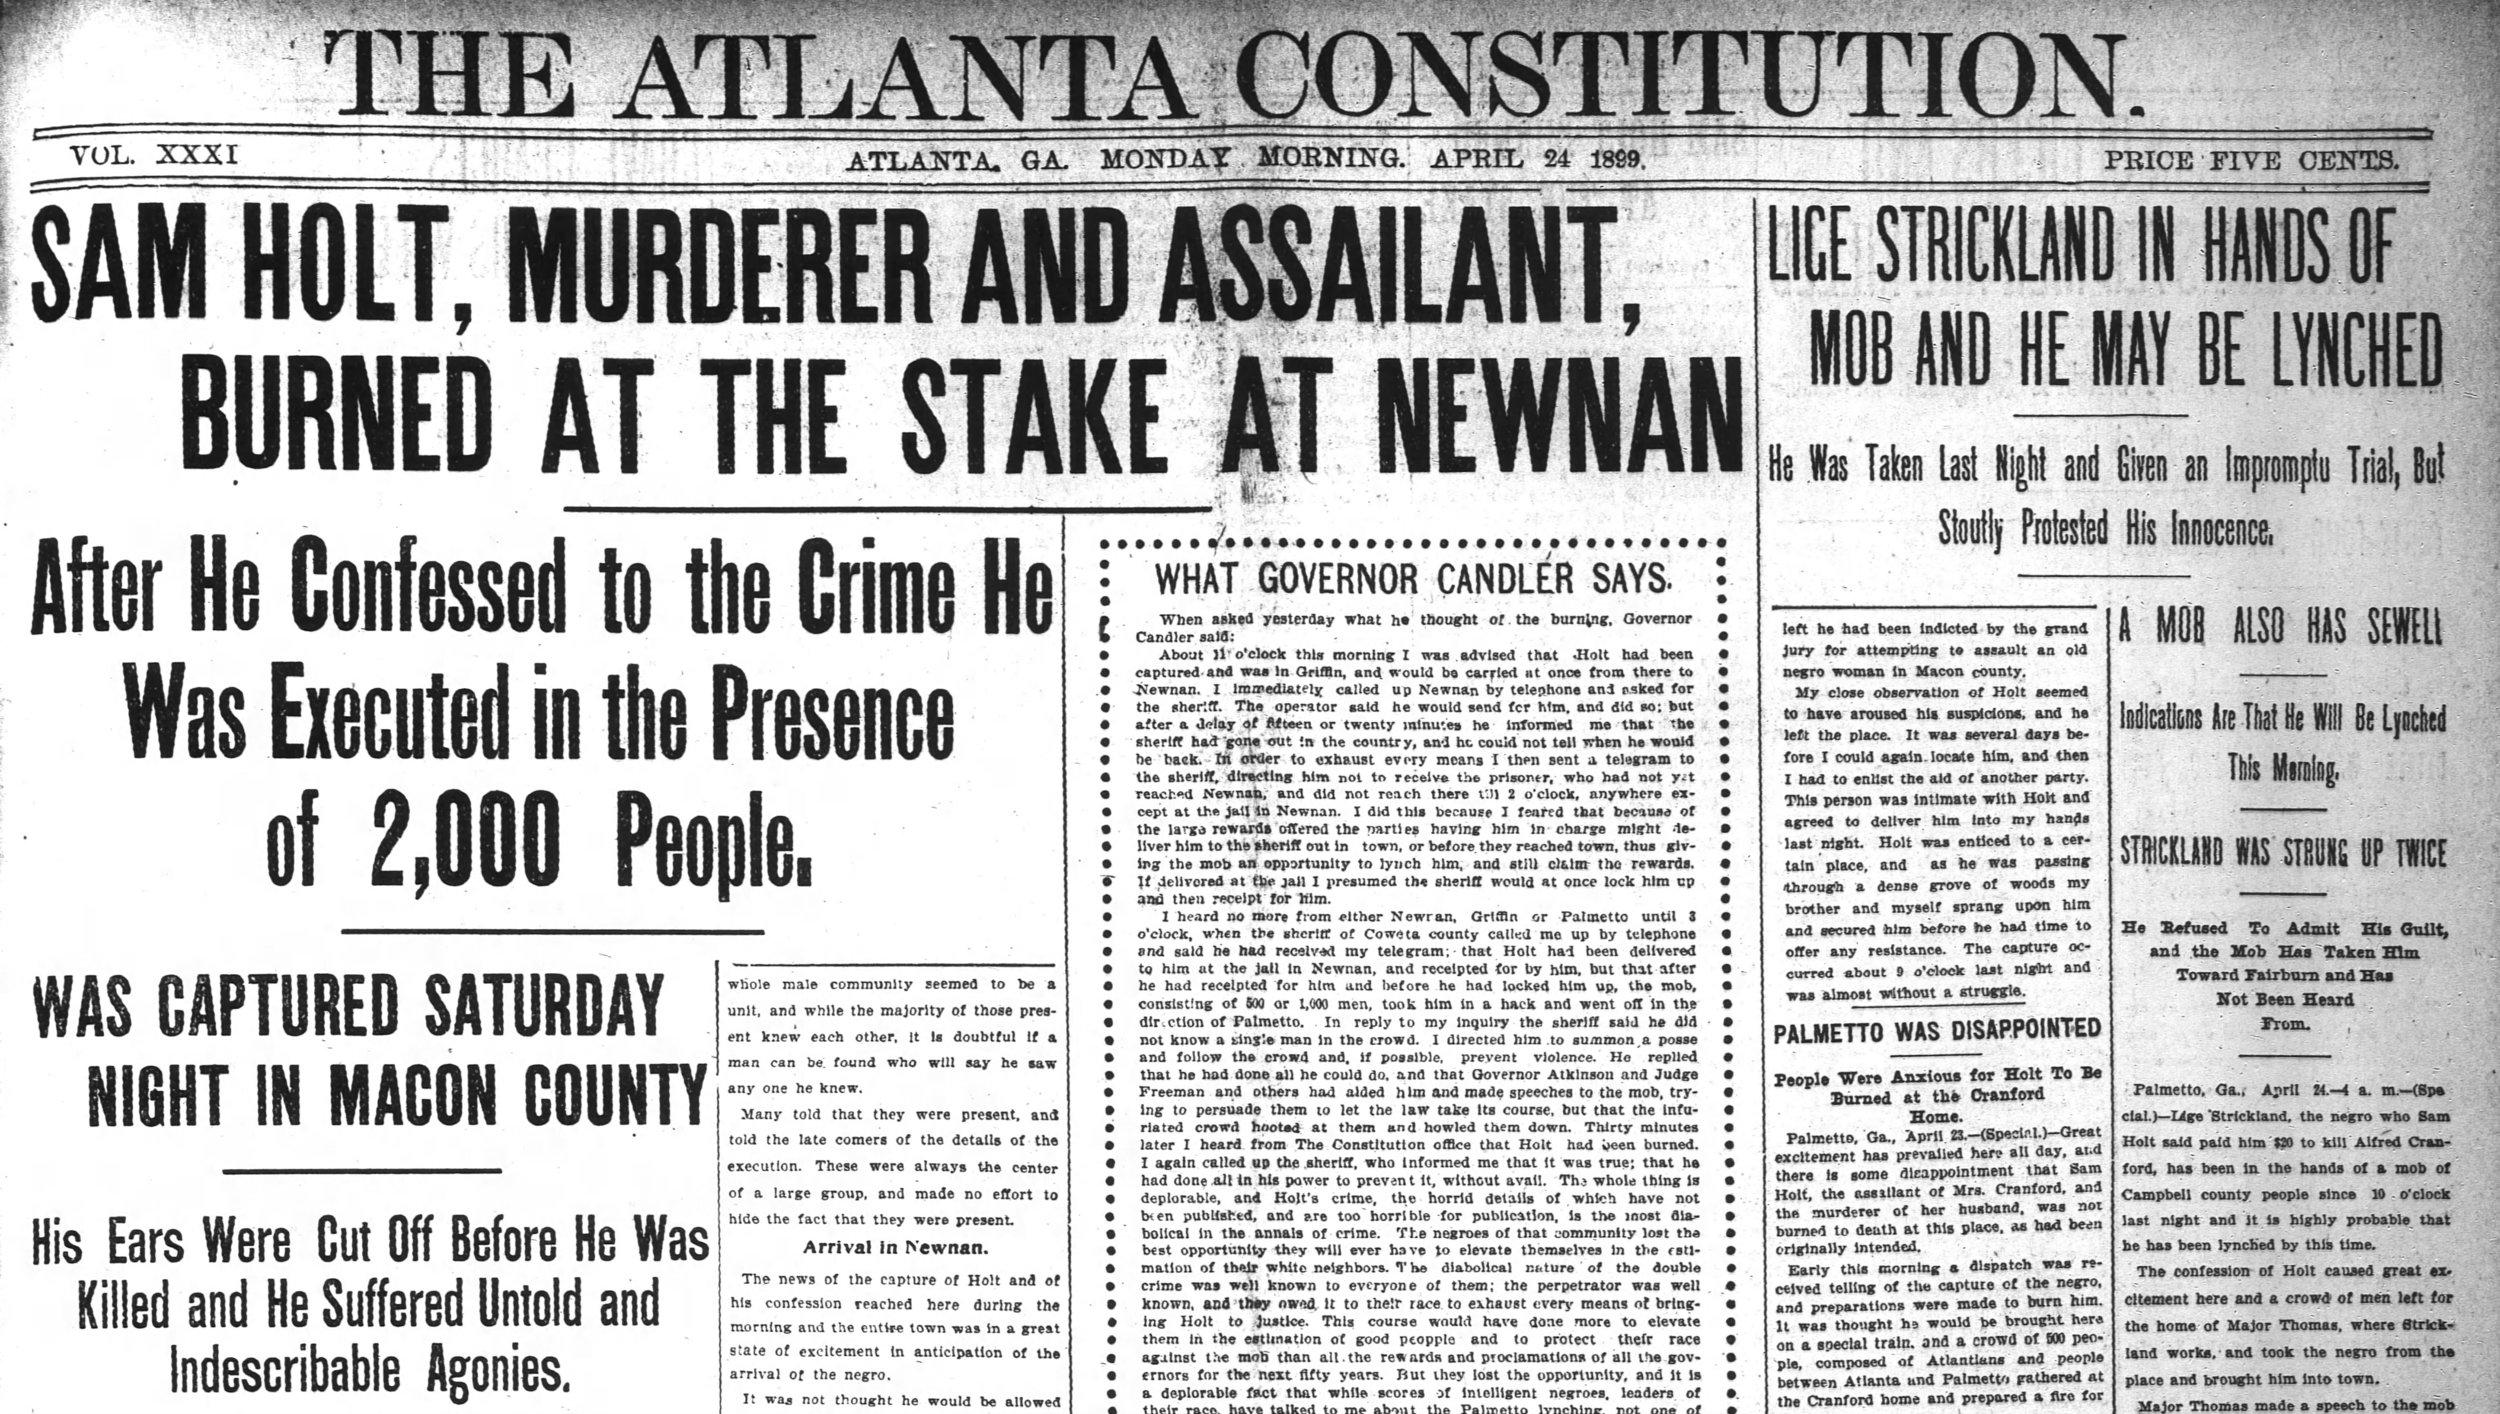 The_Atlanta_Constitution_Mon__Apr_24__1899_-2.jpg